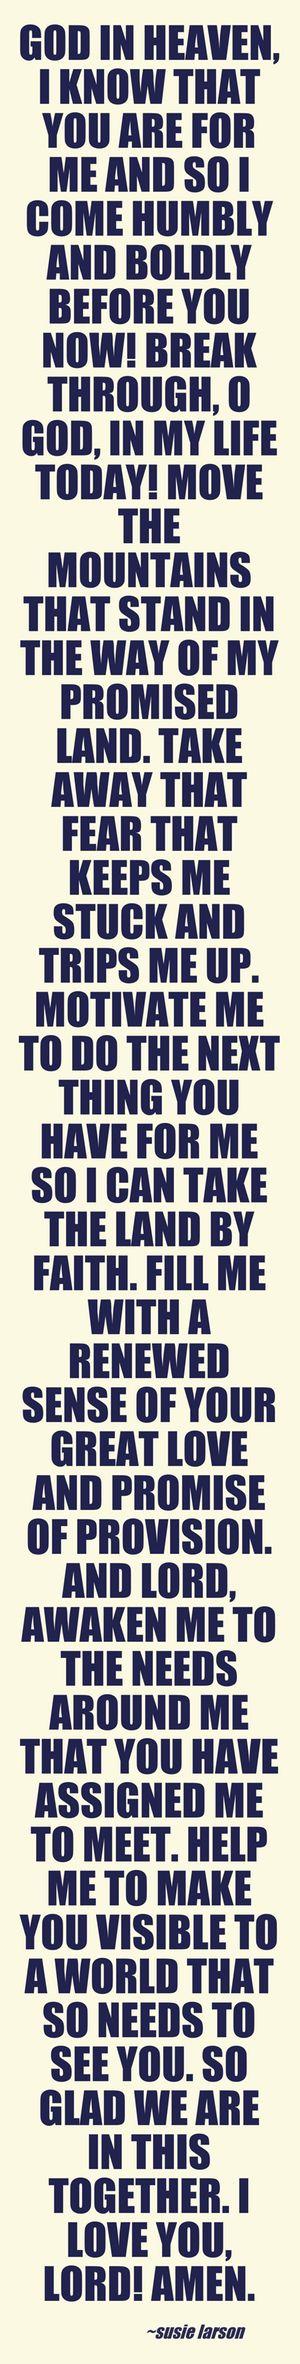 Amen my Lord <3